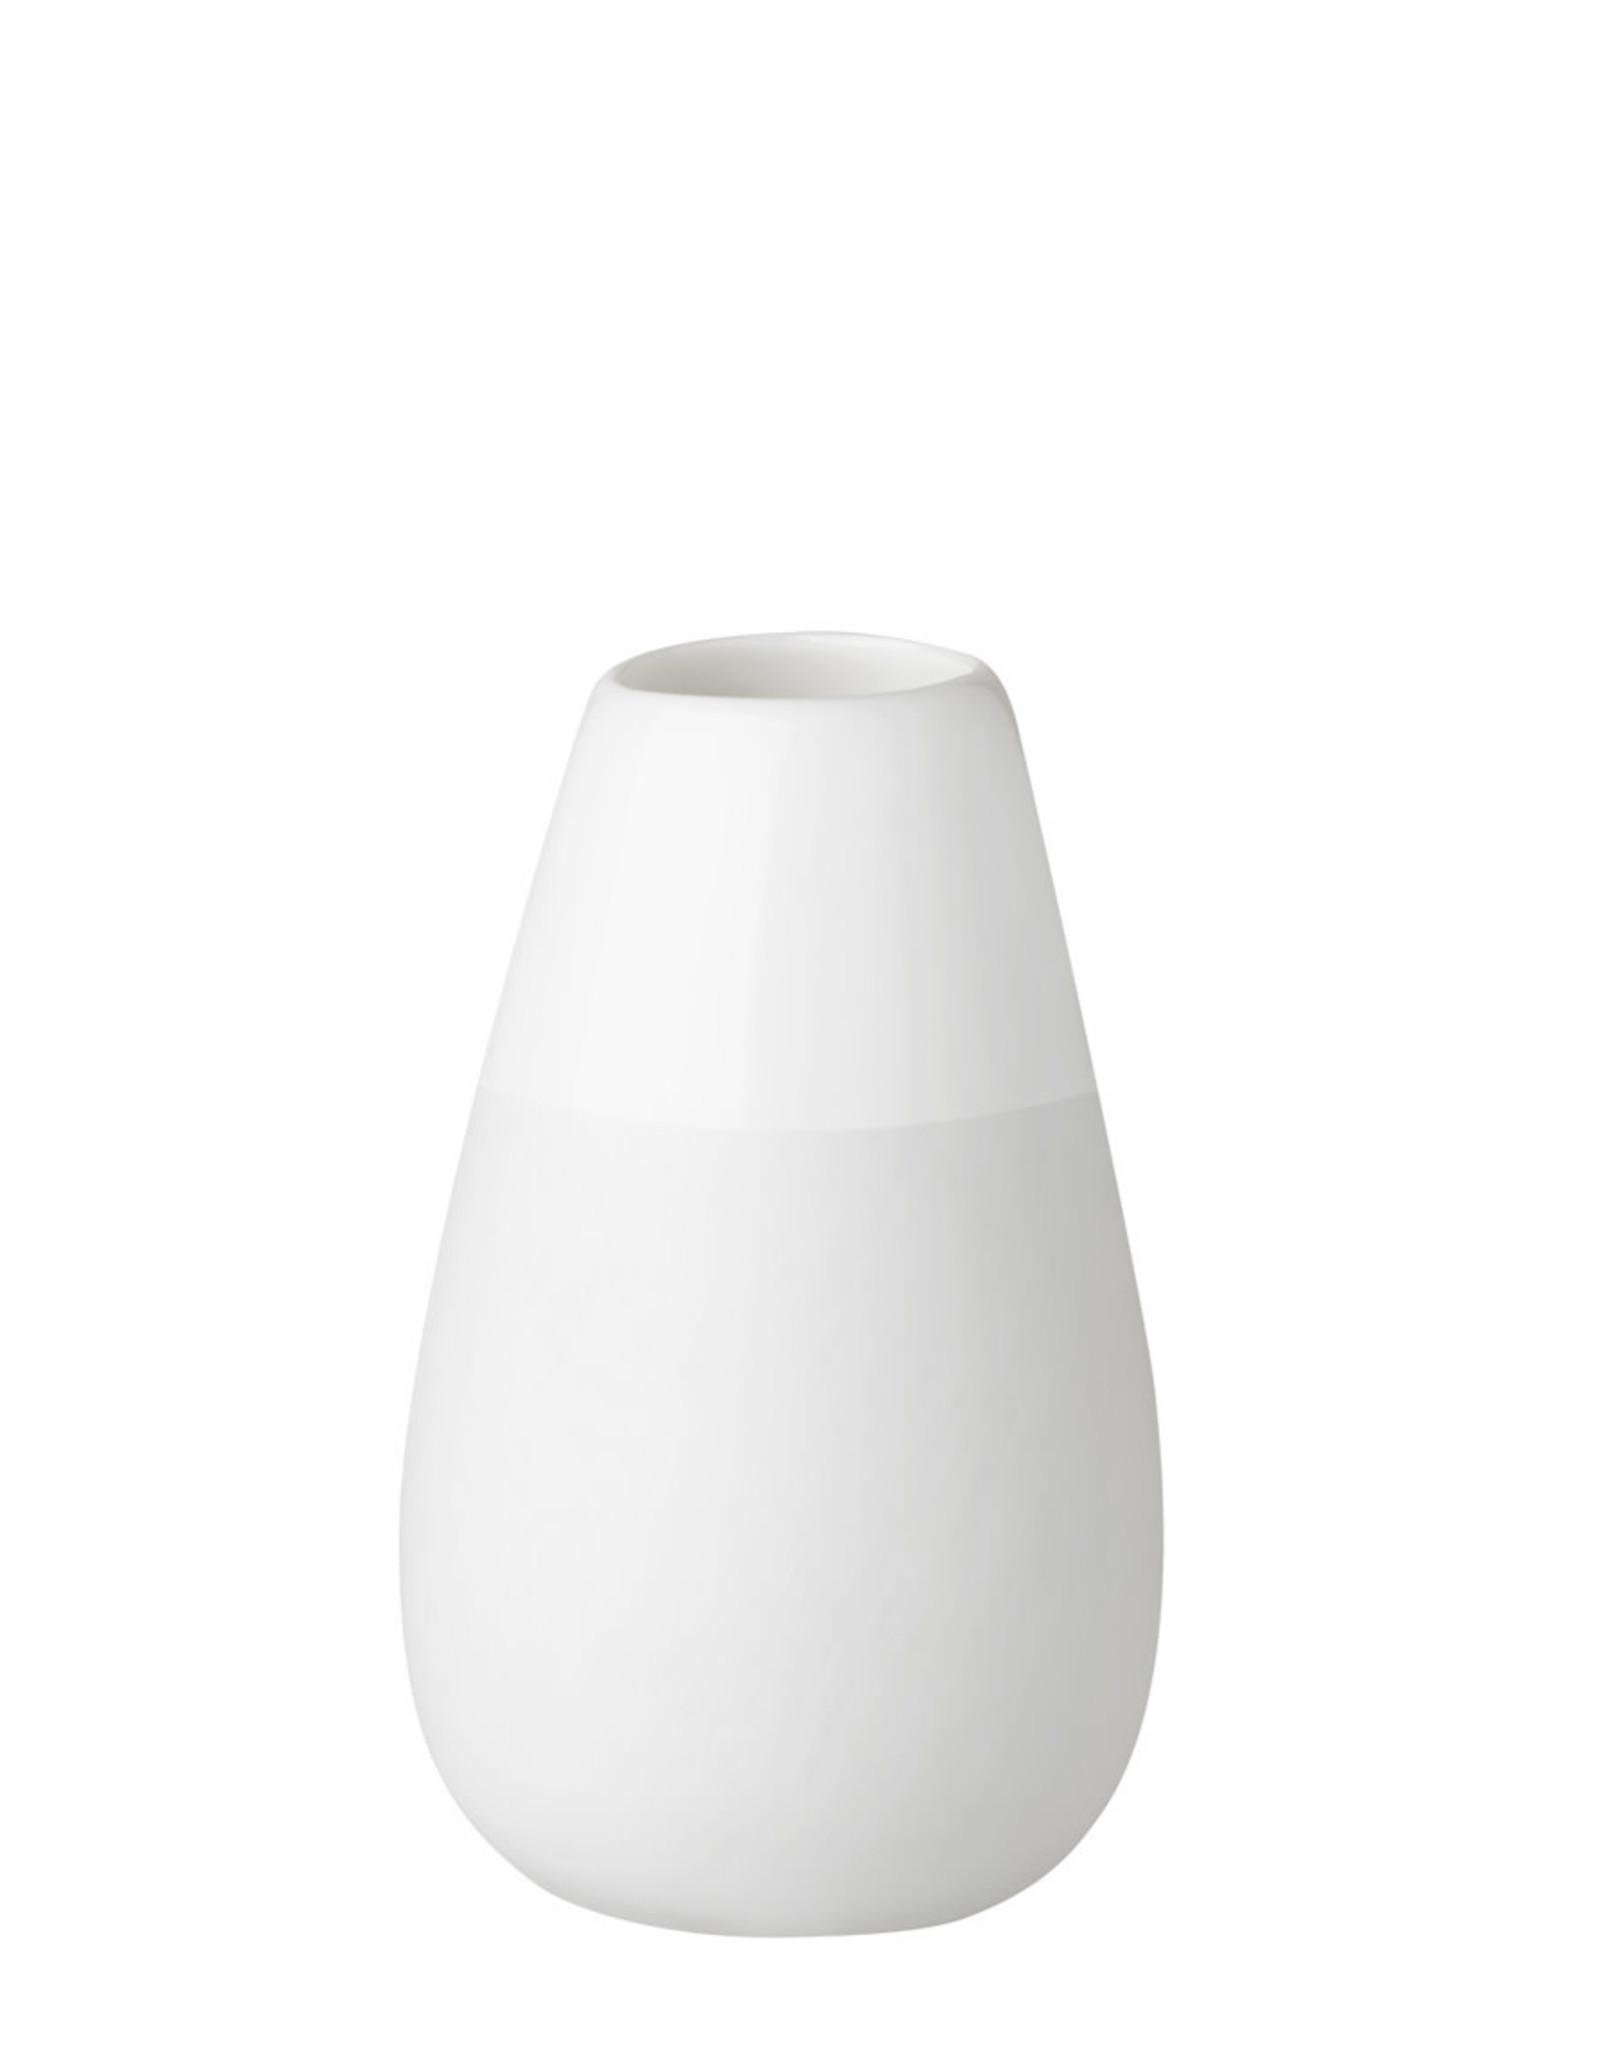 Räder Rader - Mini vase set of 4 pcs